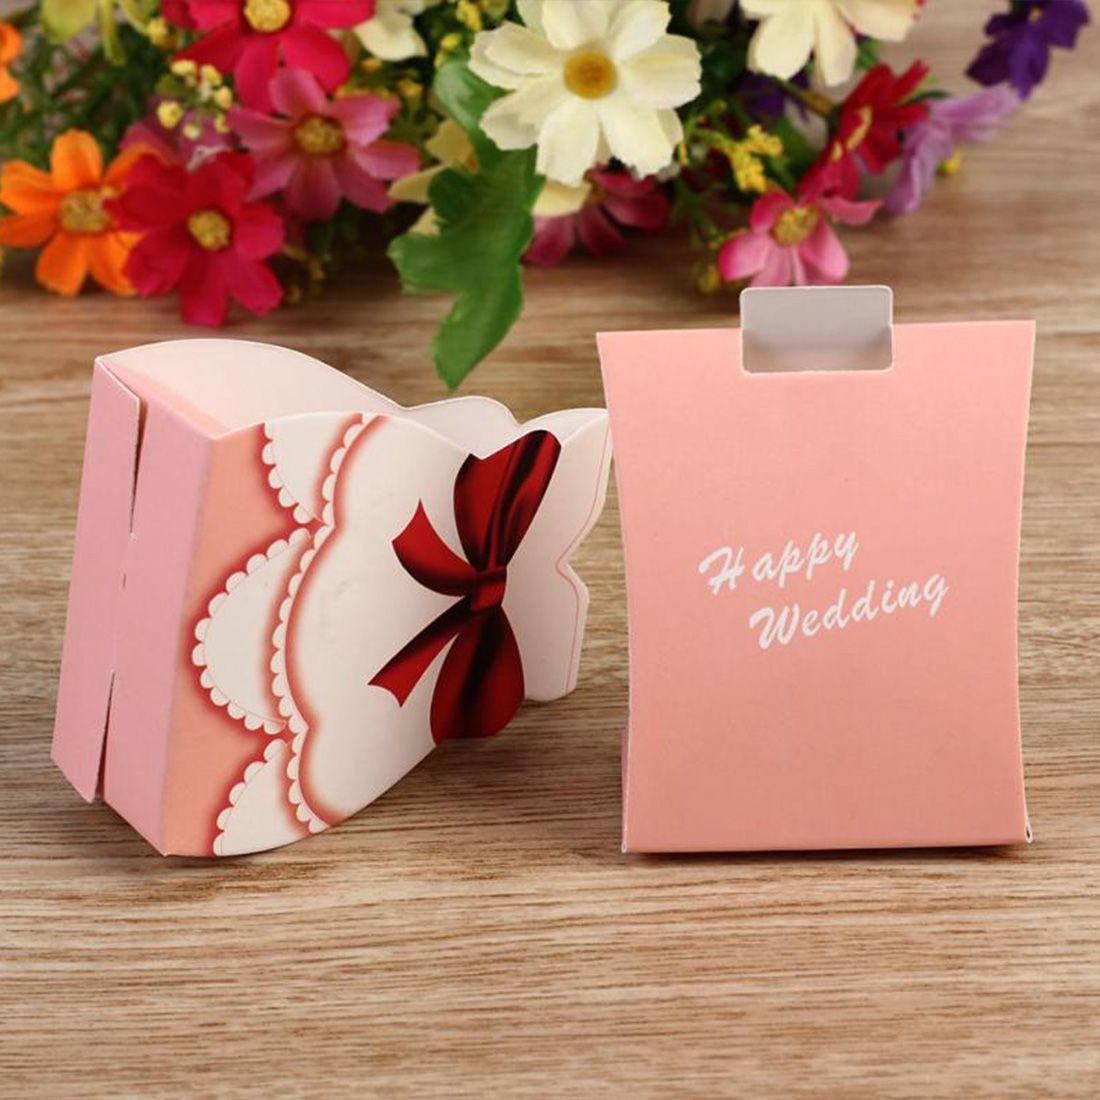 Hot 50pcs Fashion Pink Bride Groom Tuxedo Dress Gown Shape Wedding Favors Candy Gift Box